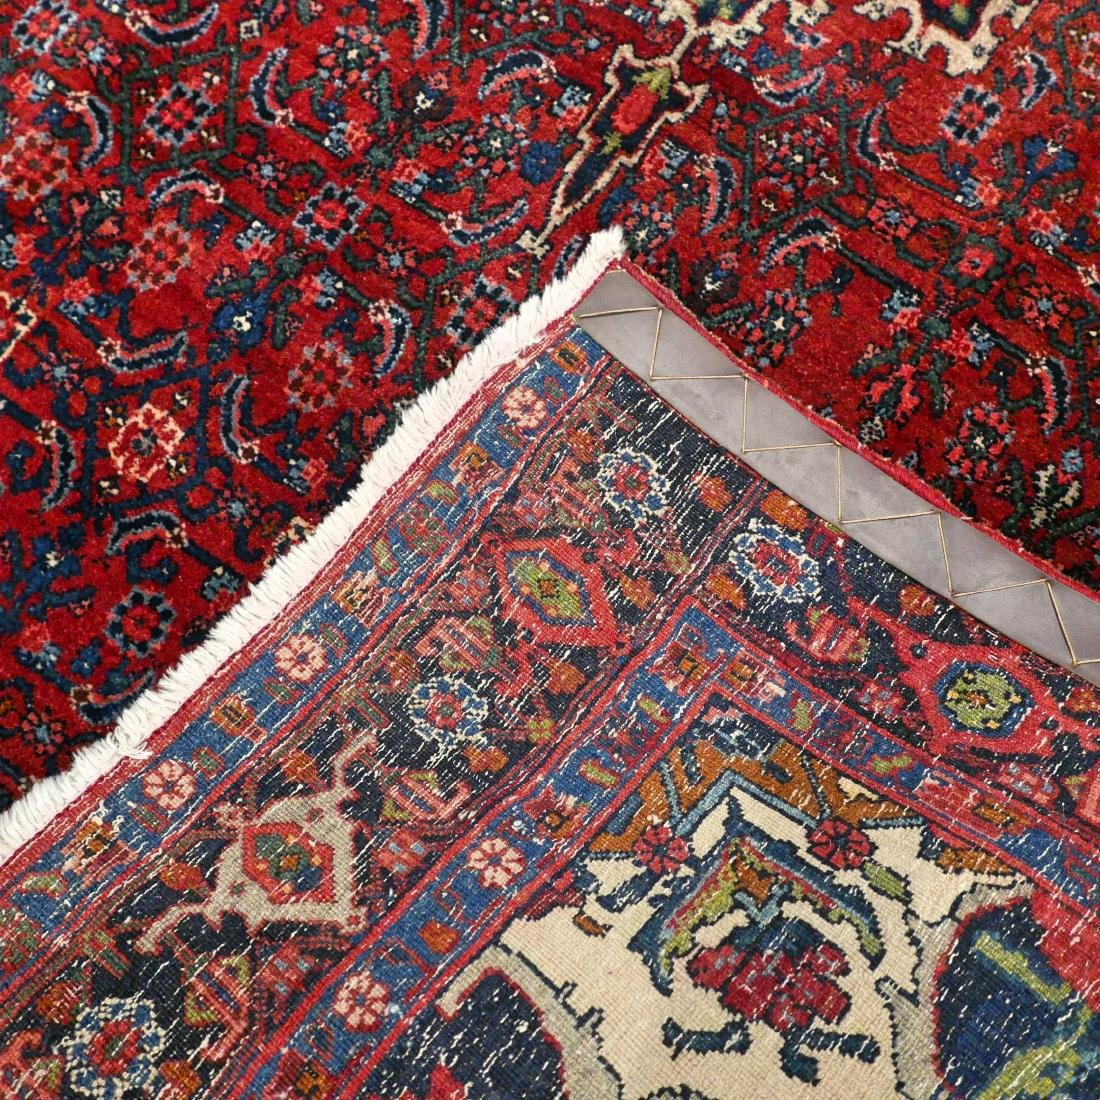 Antique Hand Knotted Bidjar Tug 7.5x4.7 - 2